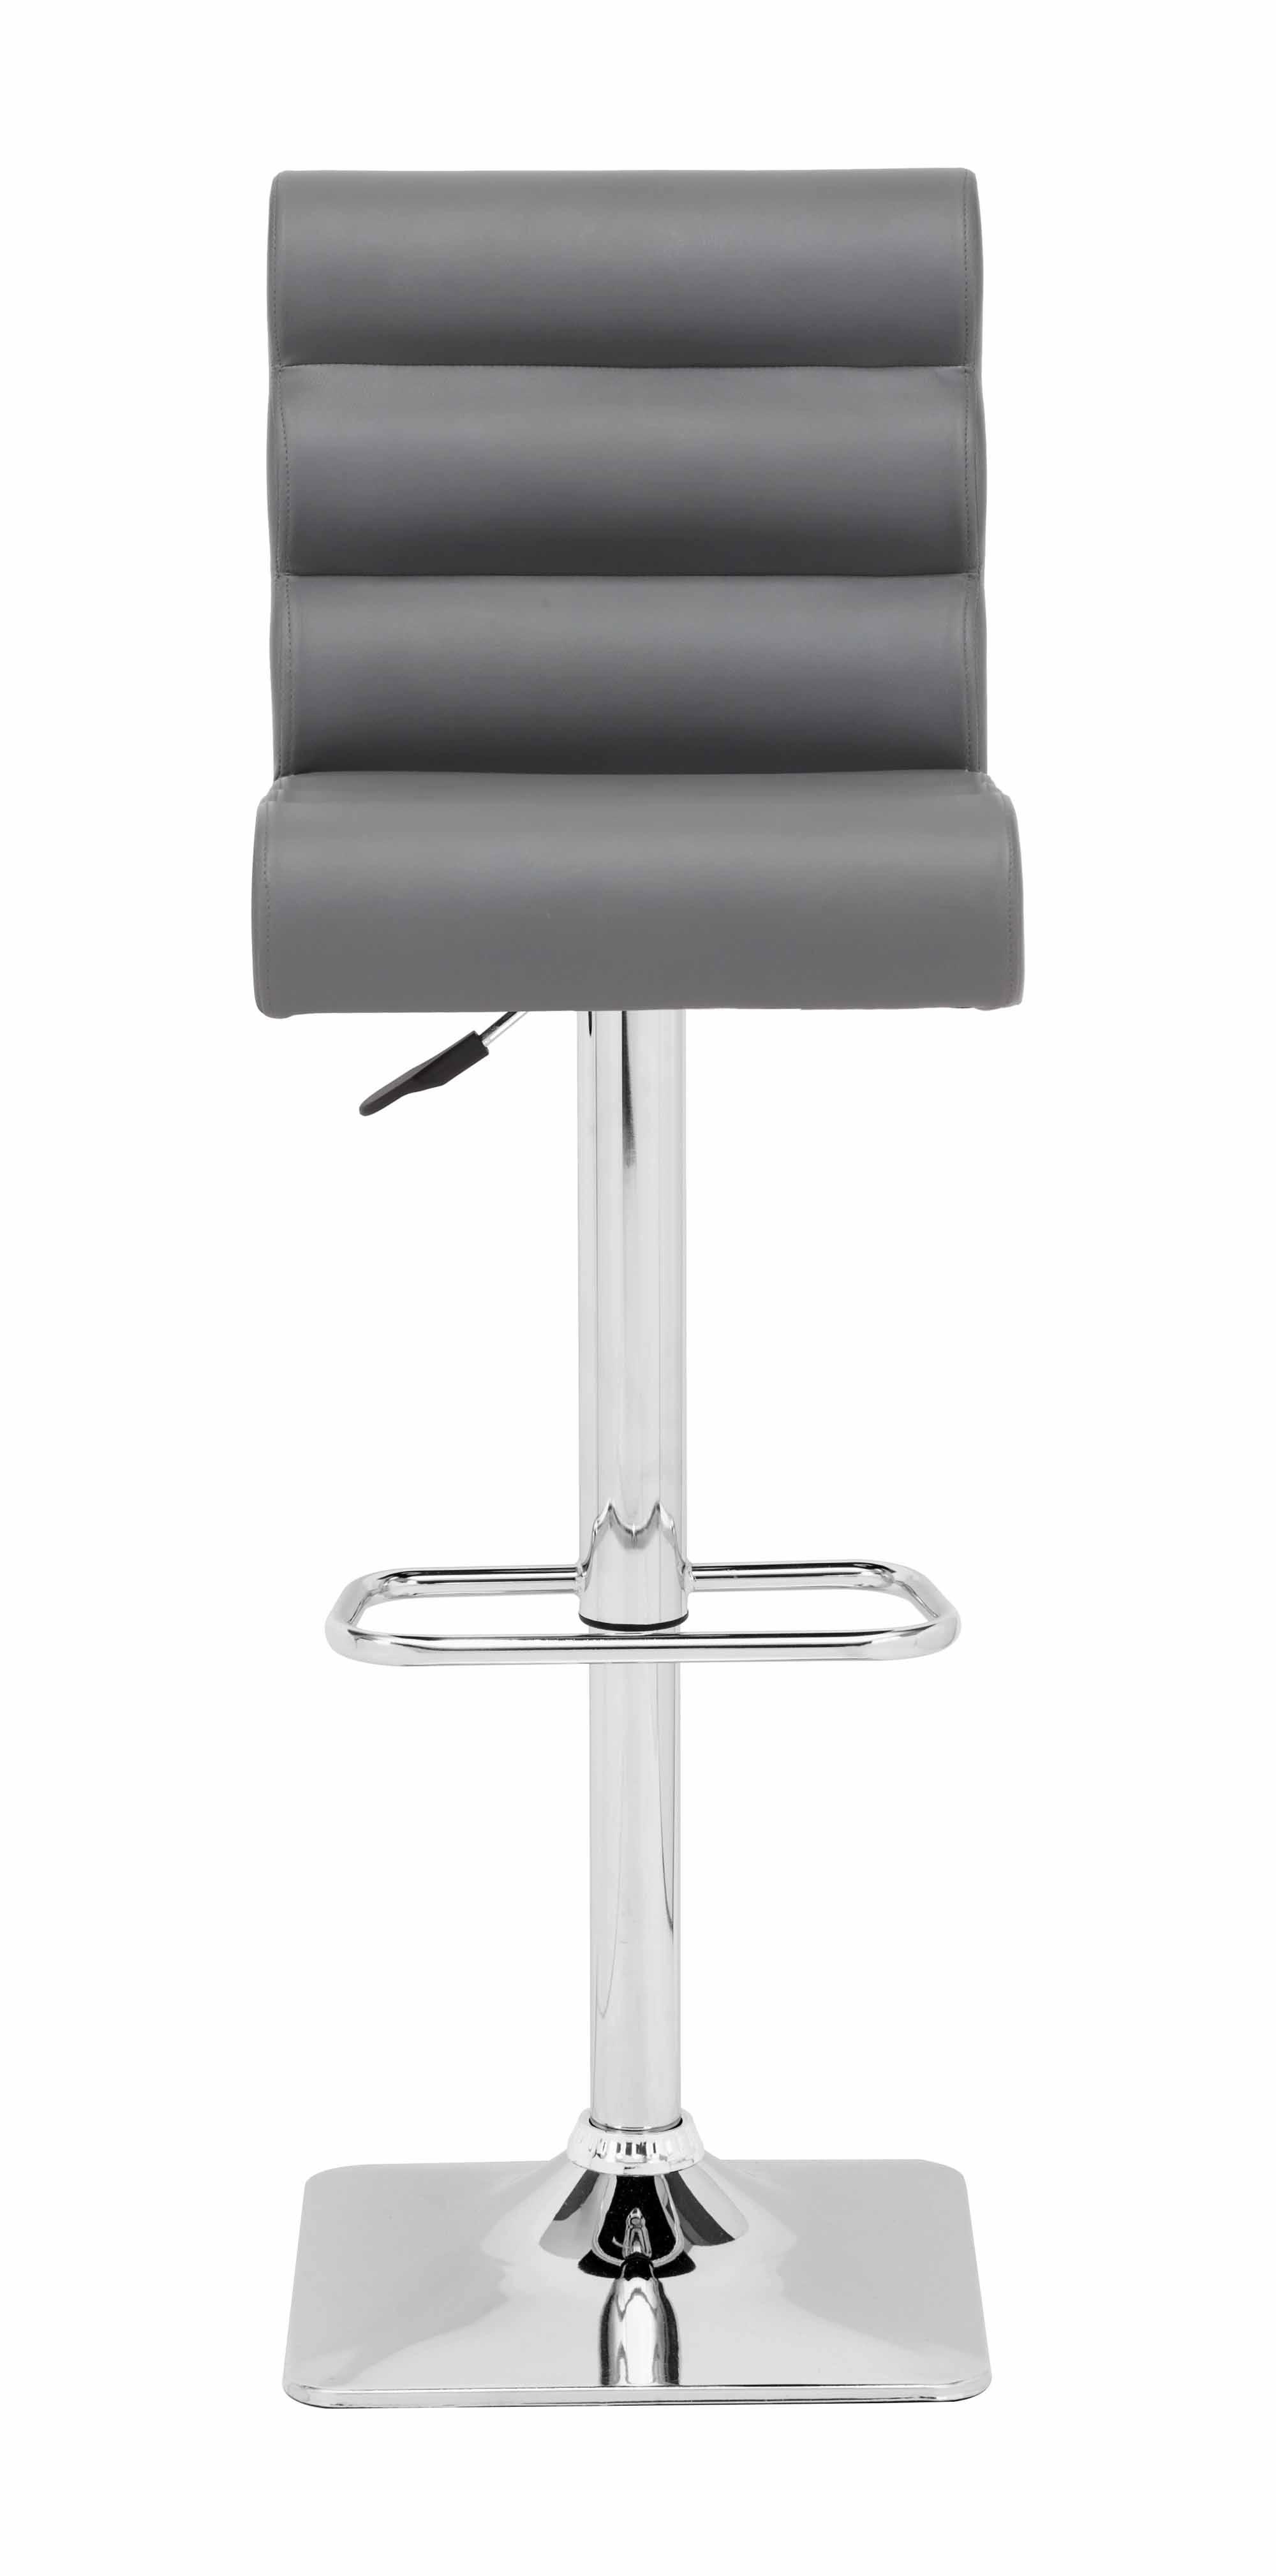 Nitro Bar Chair Gray by Zuo Modern : 301380 3 from futonland.com size 2000 x 4038 jpeg 197kB